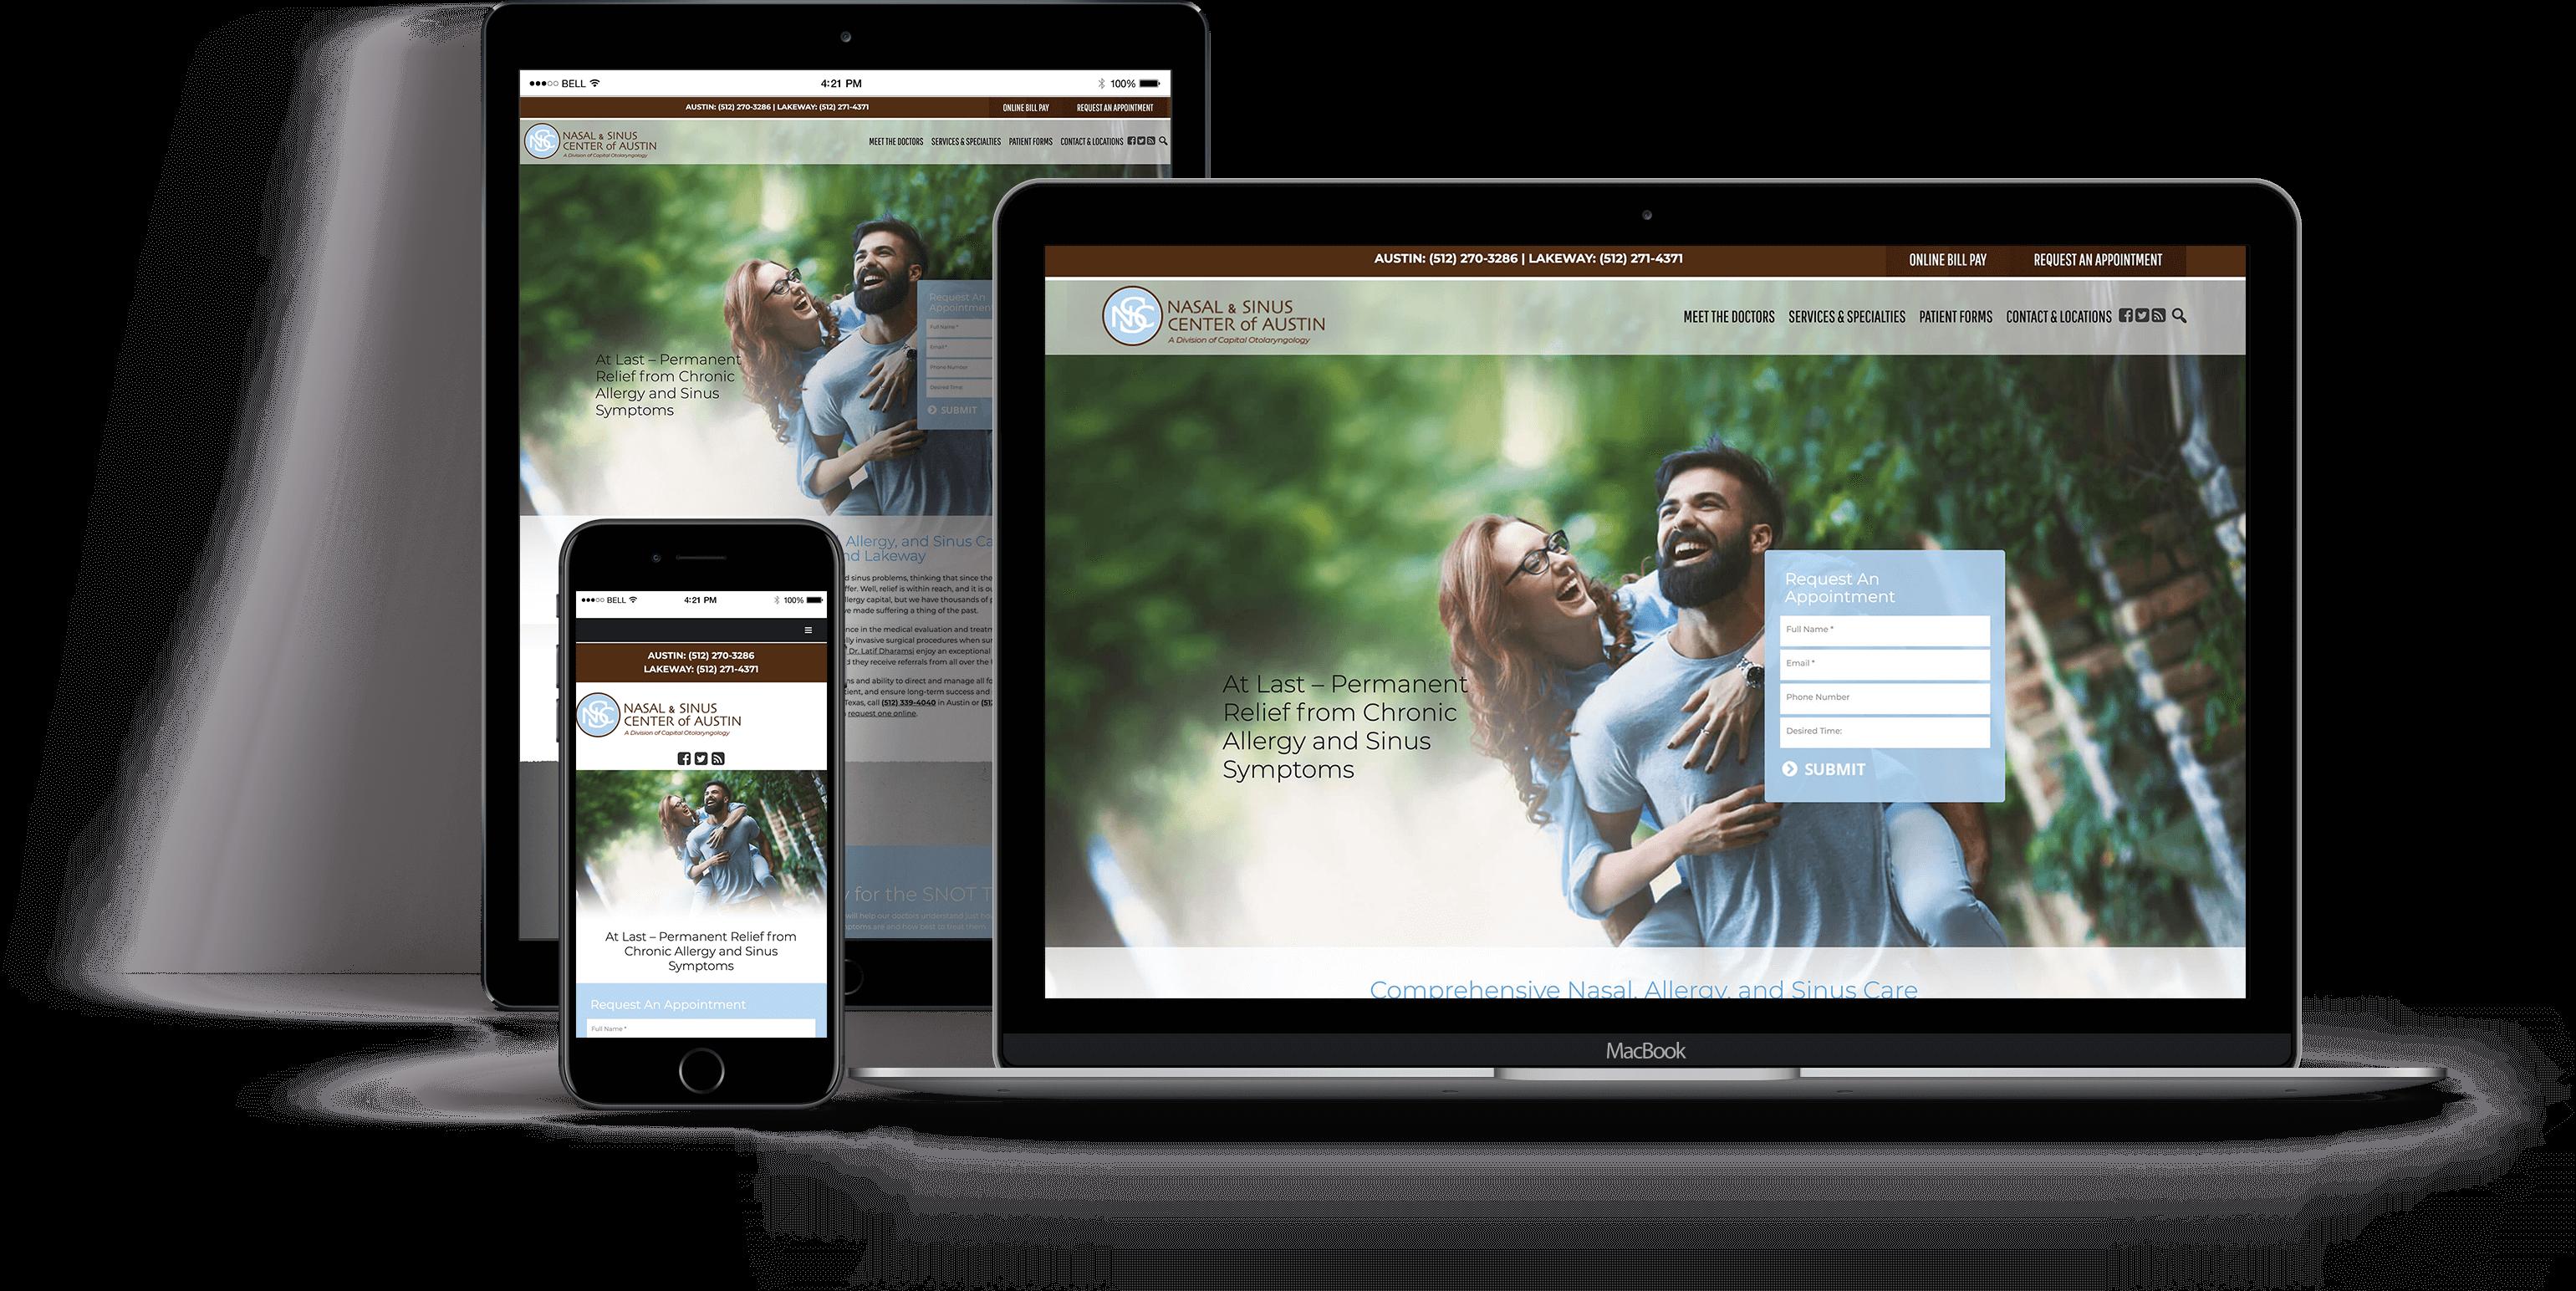 Website Design for OBGYN - Websites for ENT Practices - iHealthSpot Interactive - healthcare digital marketing